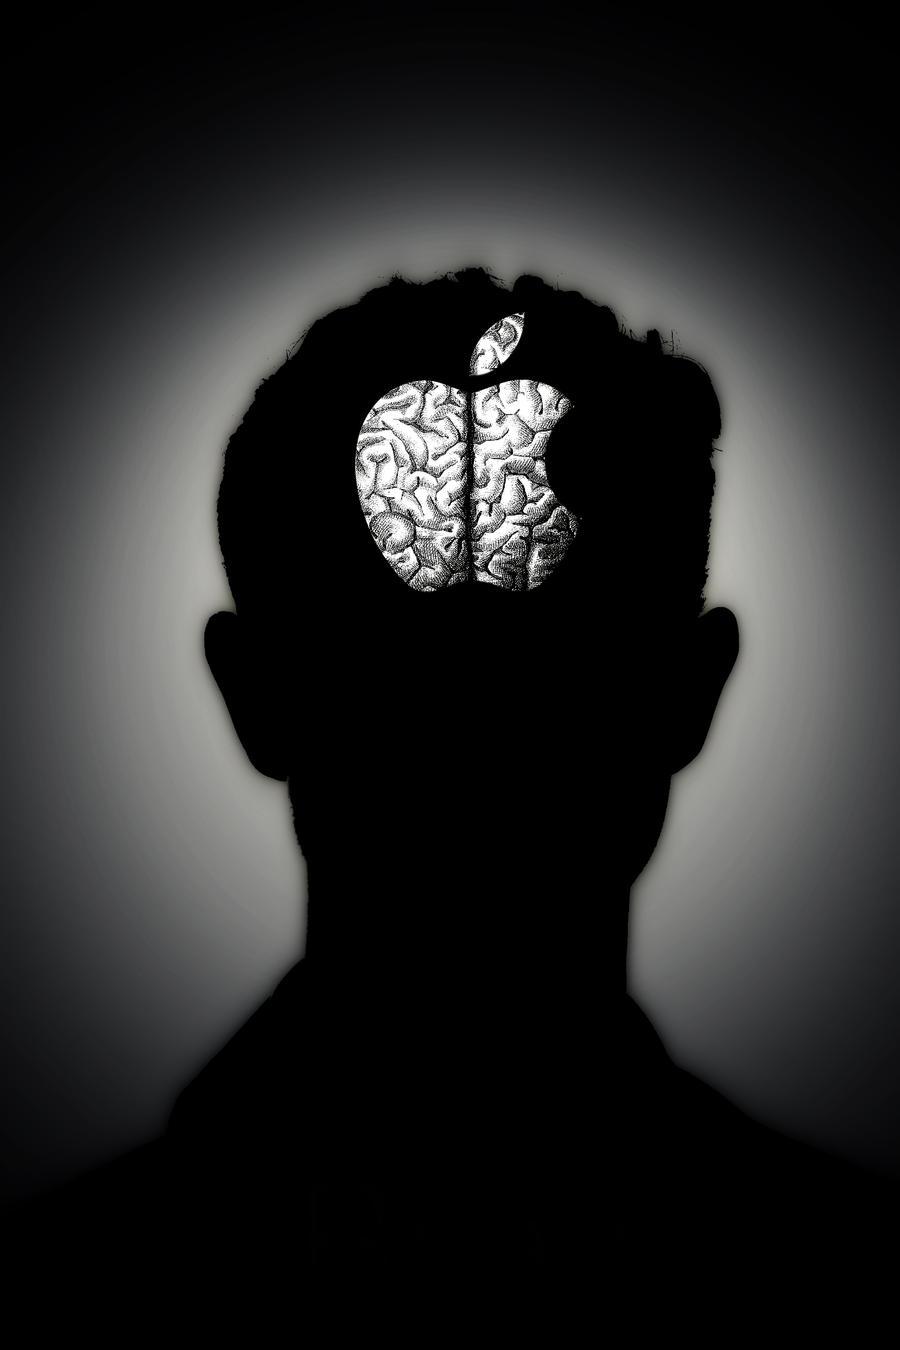 Apple Brain.